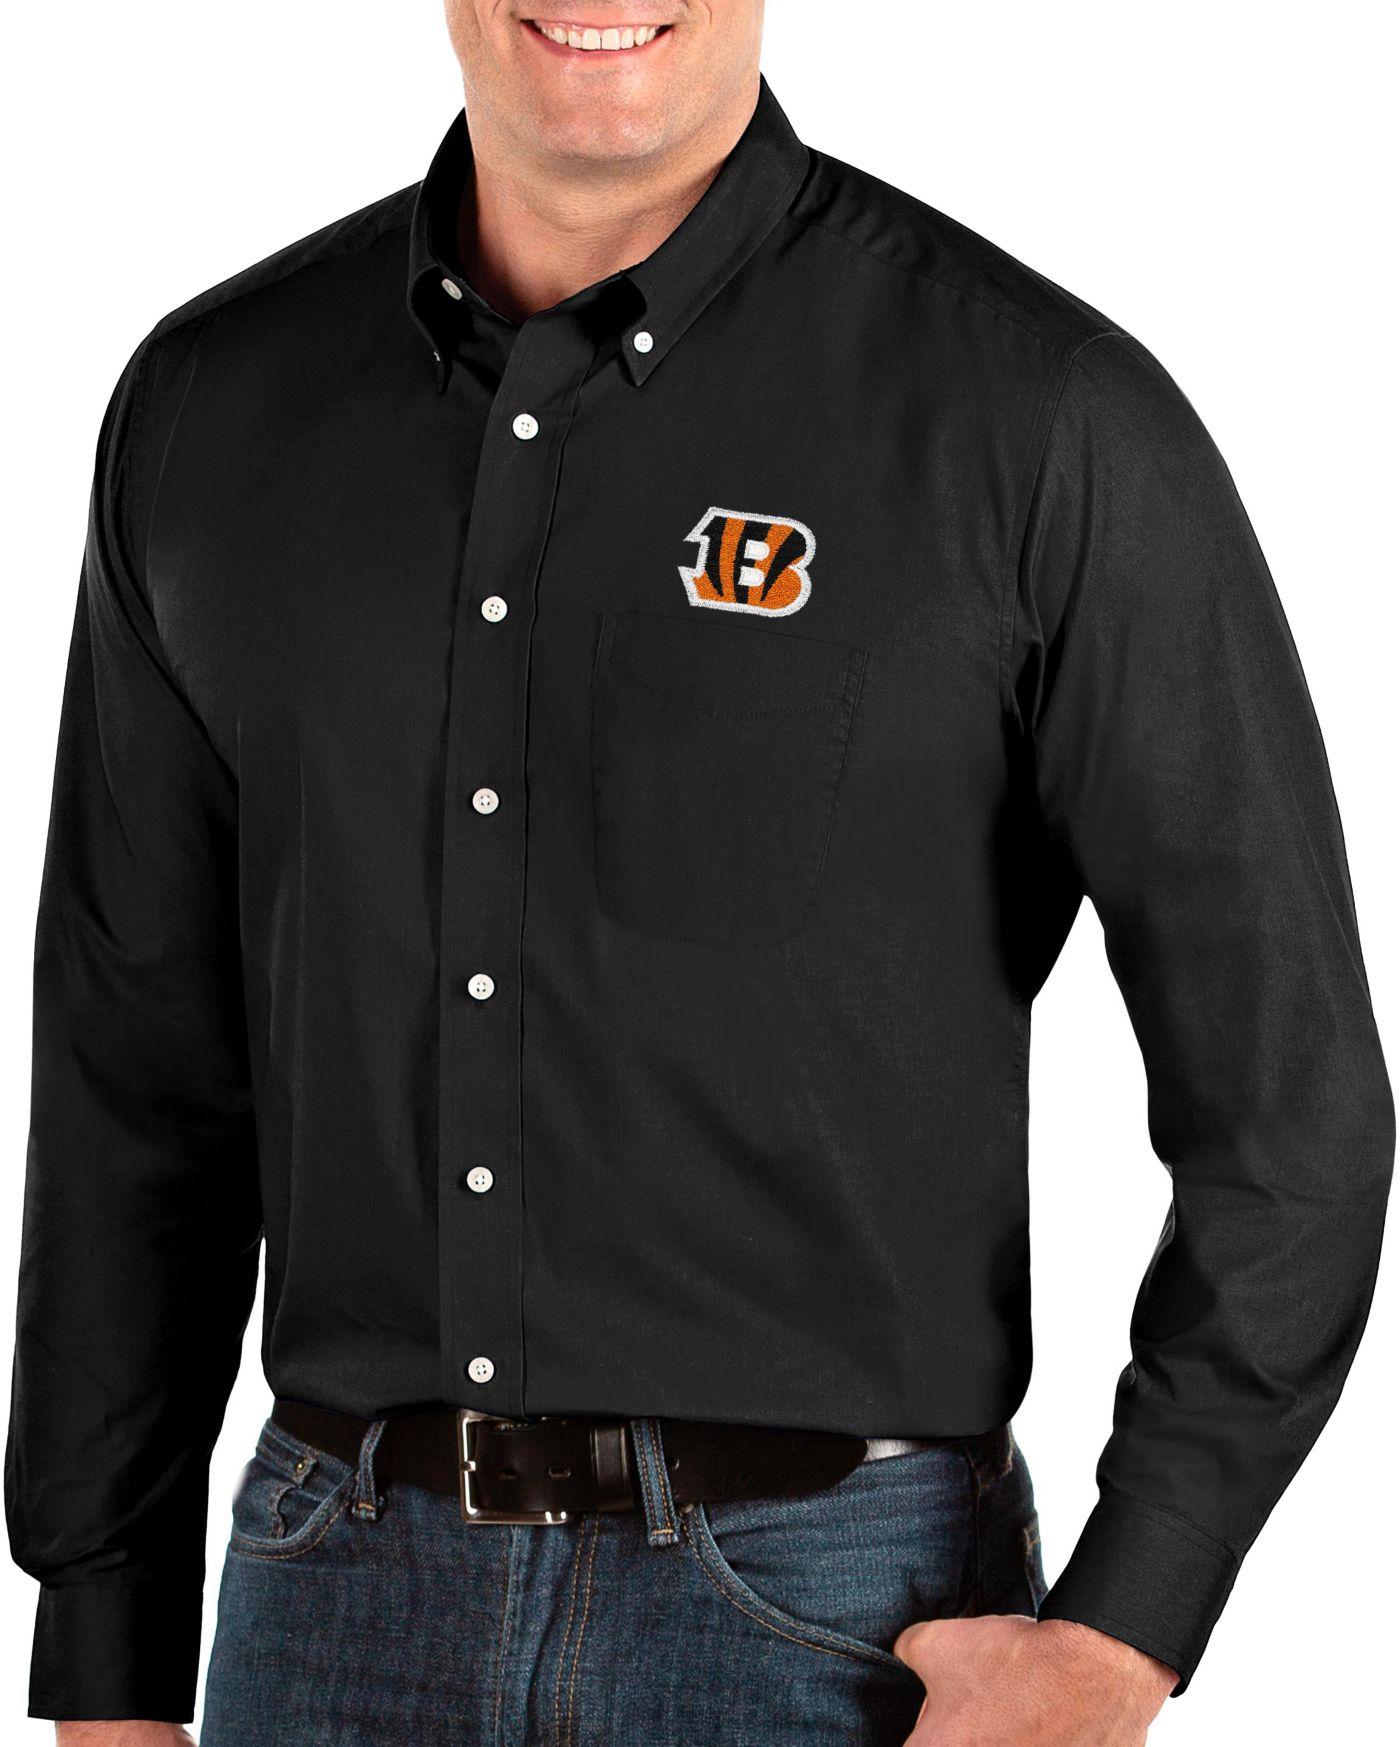 Antigua Men's Cincinnati Bengals Dynasty Button Down Black Dress Shirt